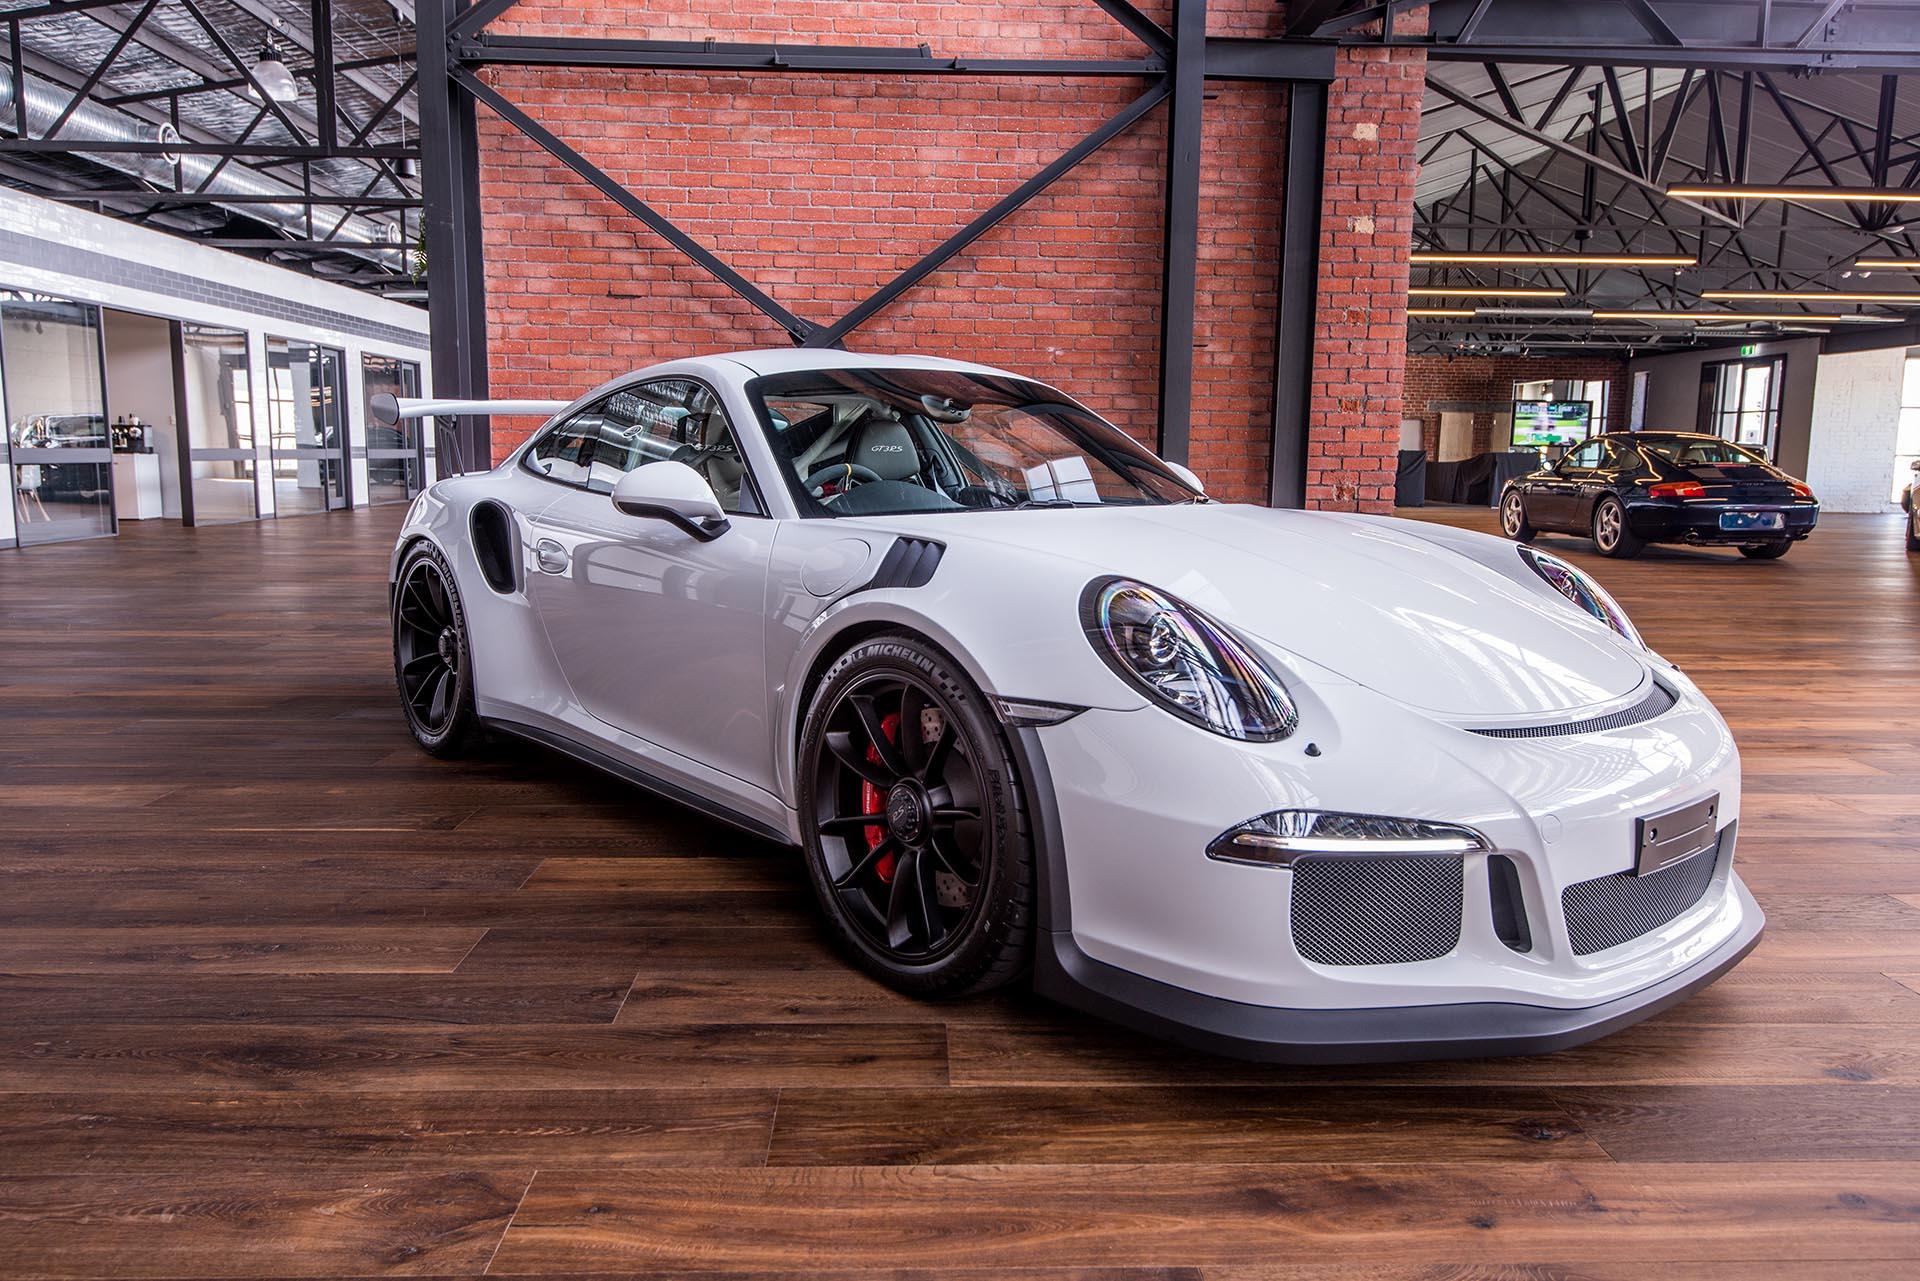 porsche 911 gt3rs richmonds classic and prestige cars storage and sales adelaide australia. Black Bedroom Furniture Sets. Home Design Ideas